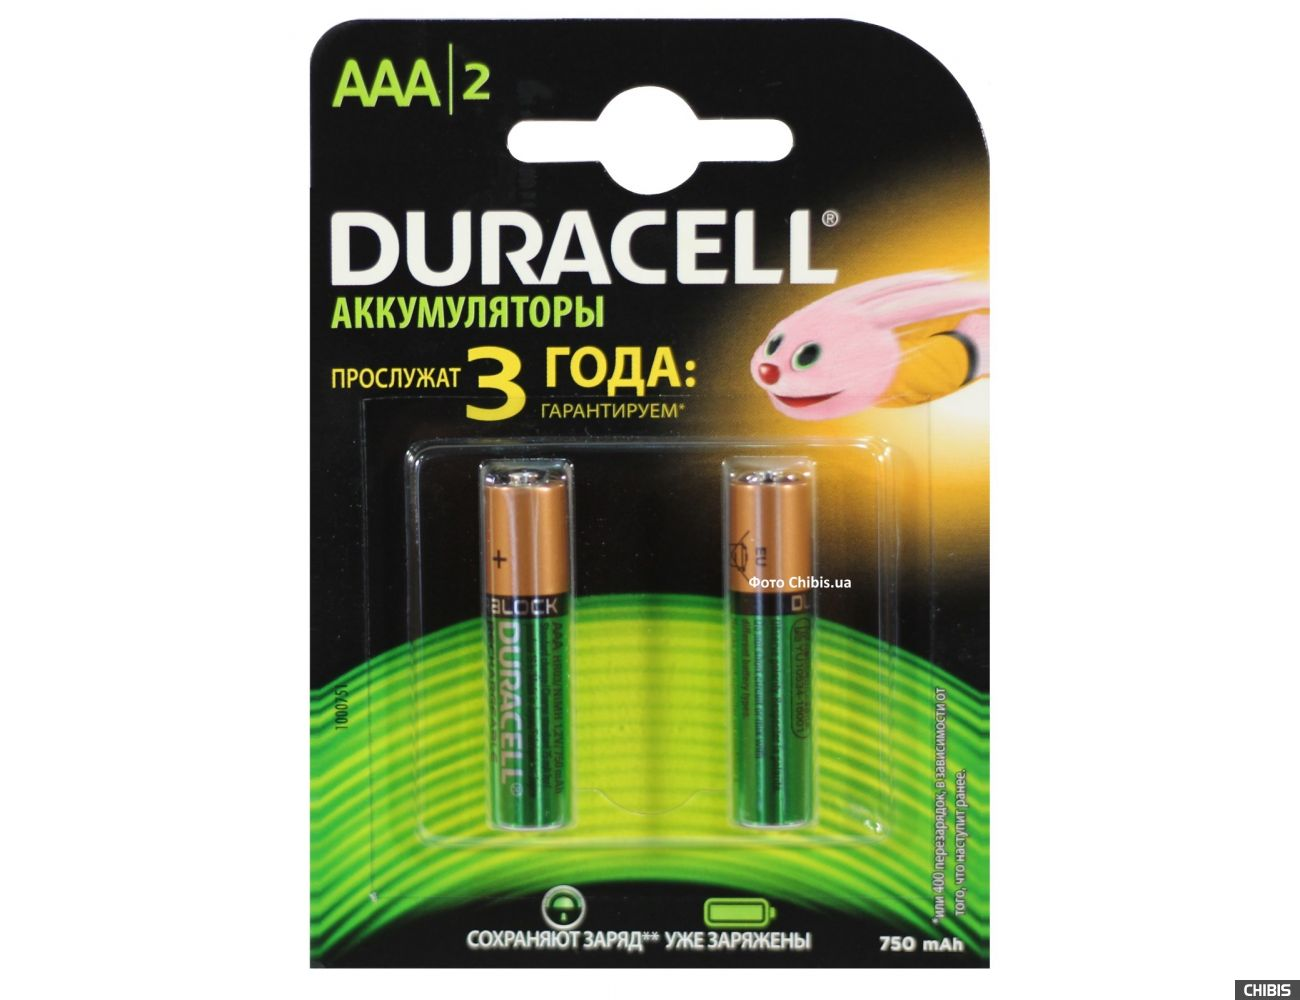 Аккумуляторные батарейки ААА Duracell 750 mAh 2 шт